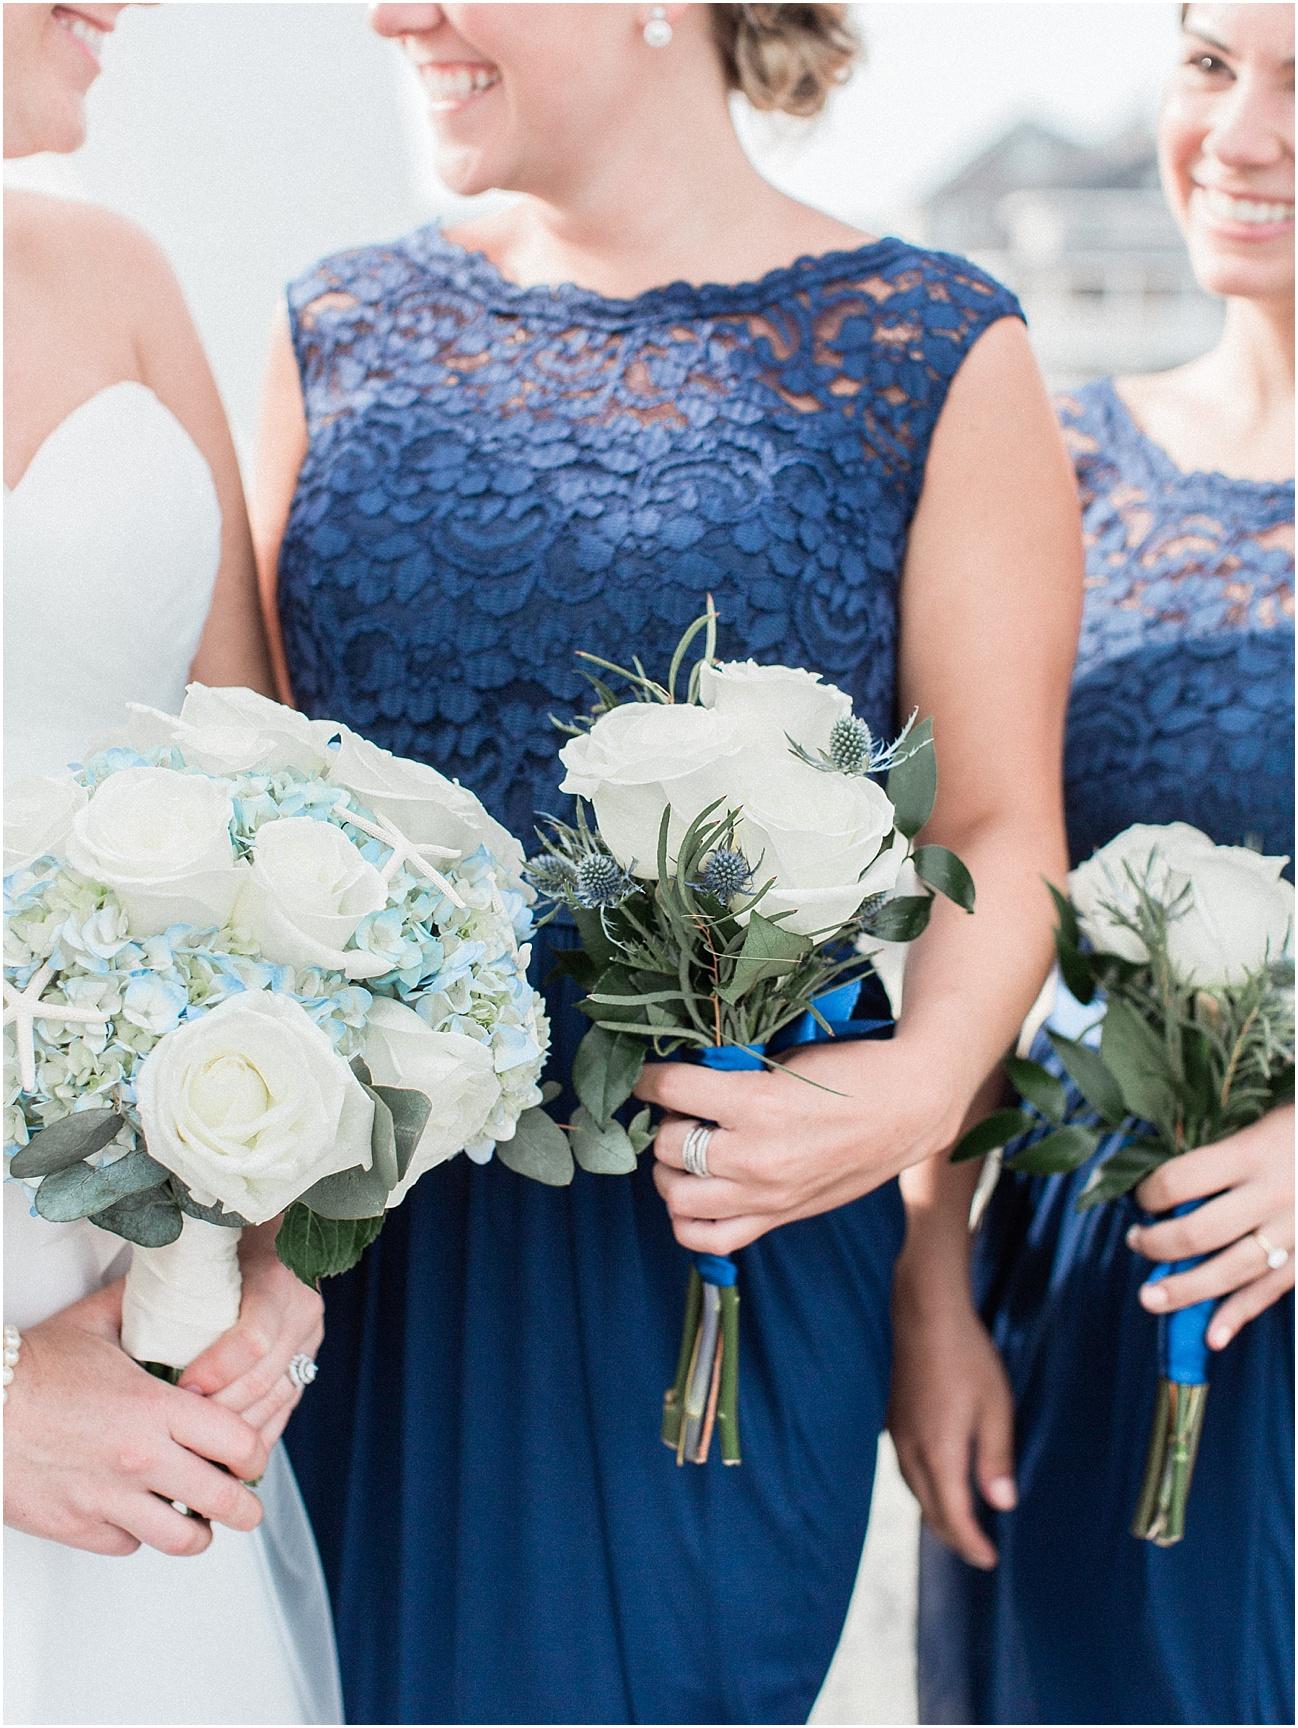 samantha_anthony_sam_old_scituate_light_barker_tavern_south_shore_cape_cod_boston_wedding_photographer_meredith_jane_photography_photo_0290.jpg